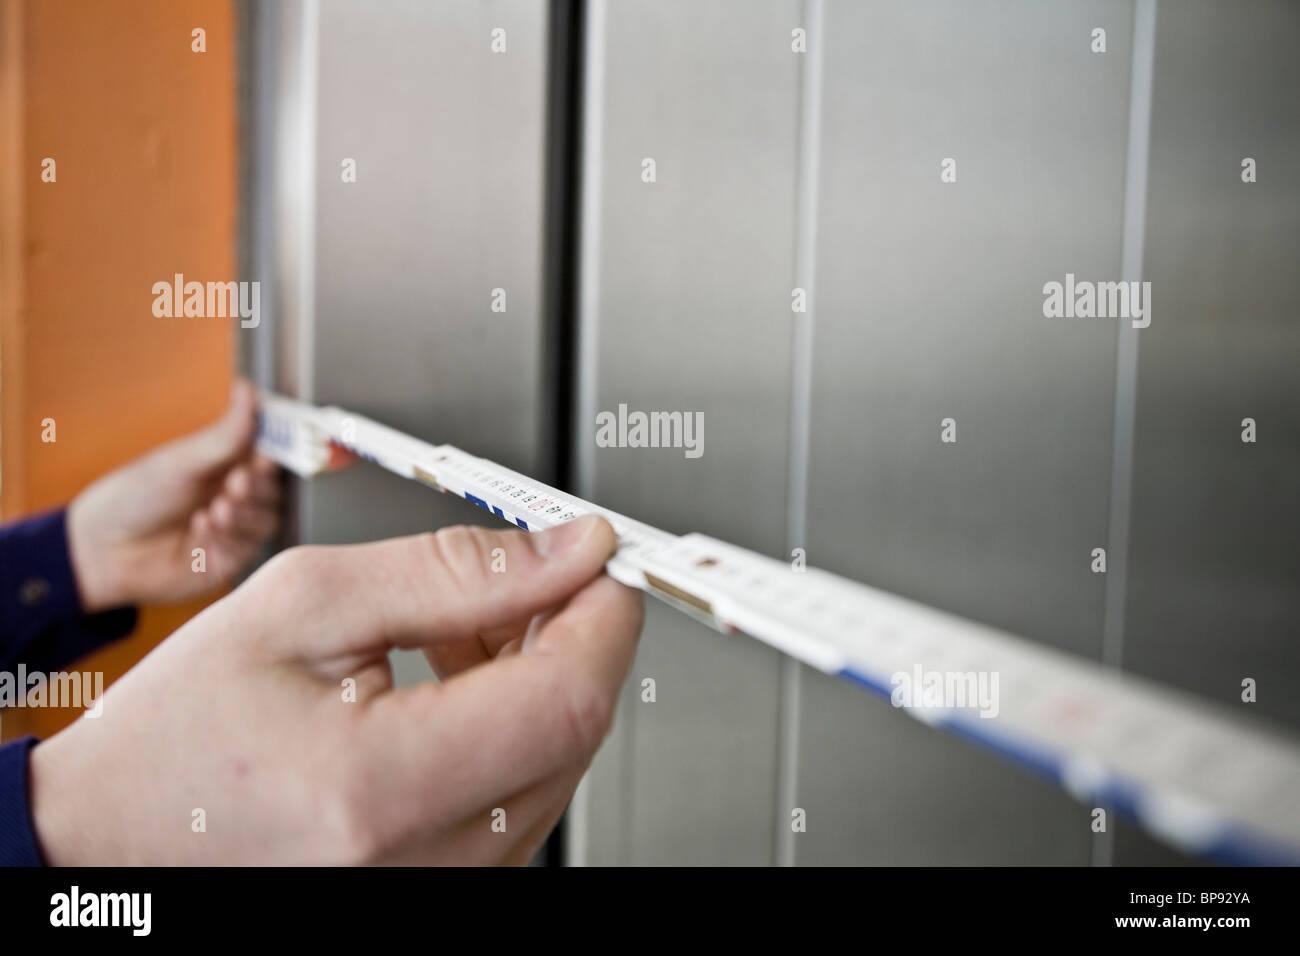 Hands holding yardstick, Munich, Bavaria, Germany - Stock Image